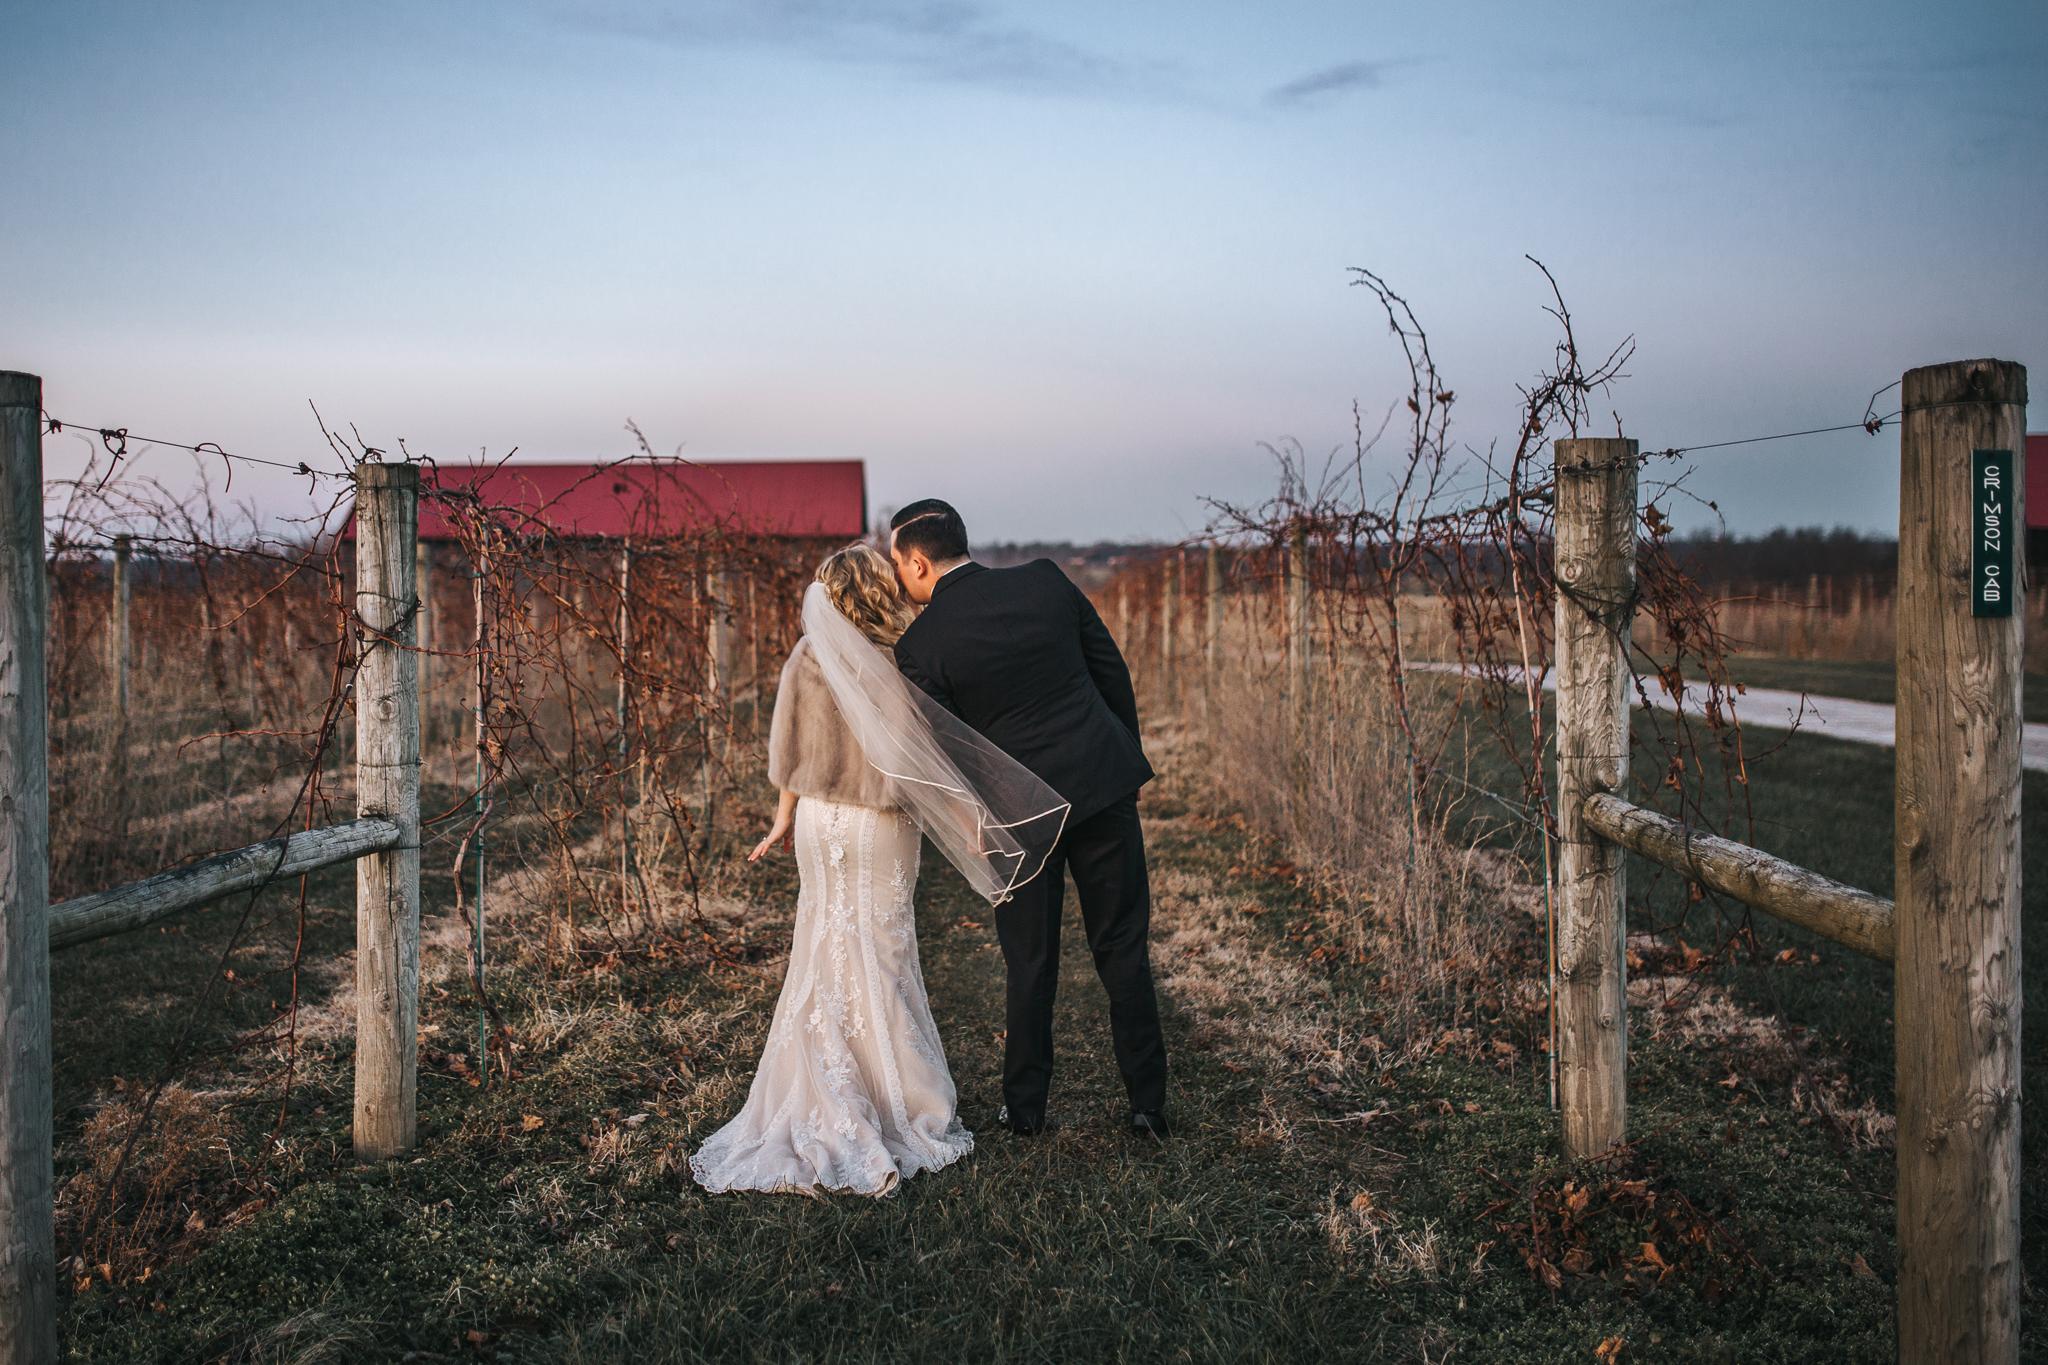 0114 Ariana Jordan Photo - Cameron & Lauren's Wedding at Talon Winery  6947.jpg